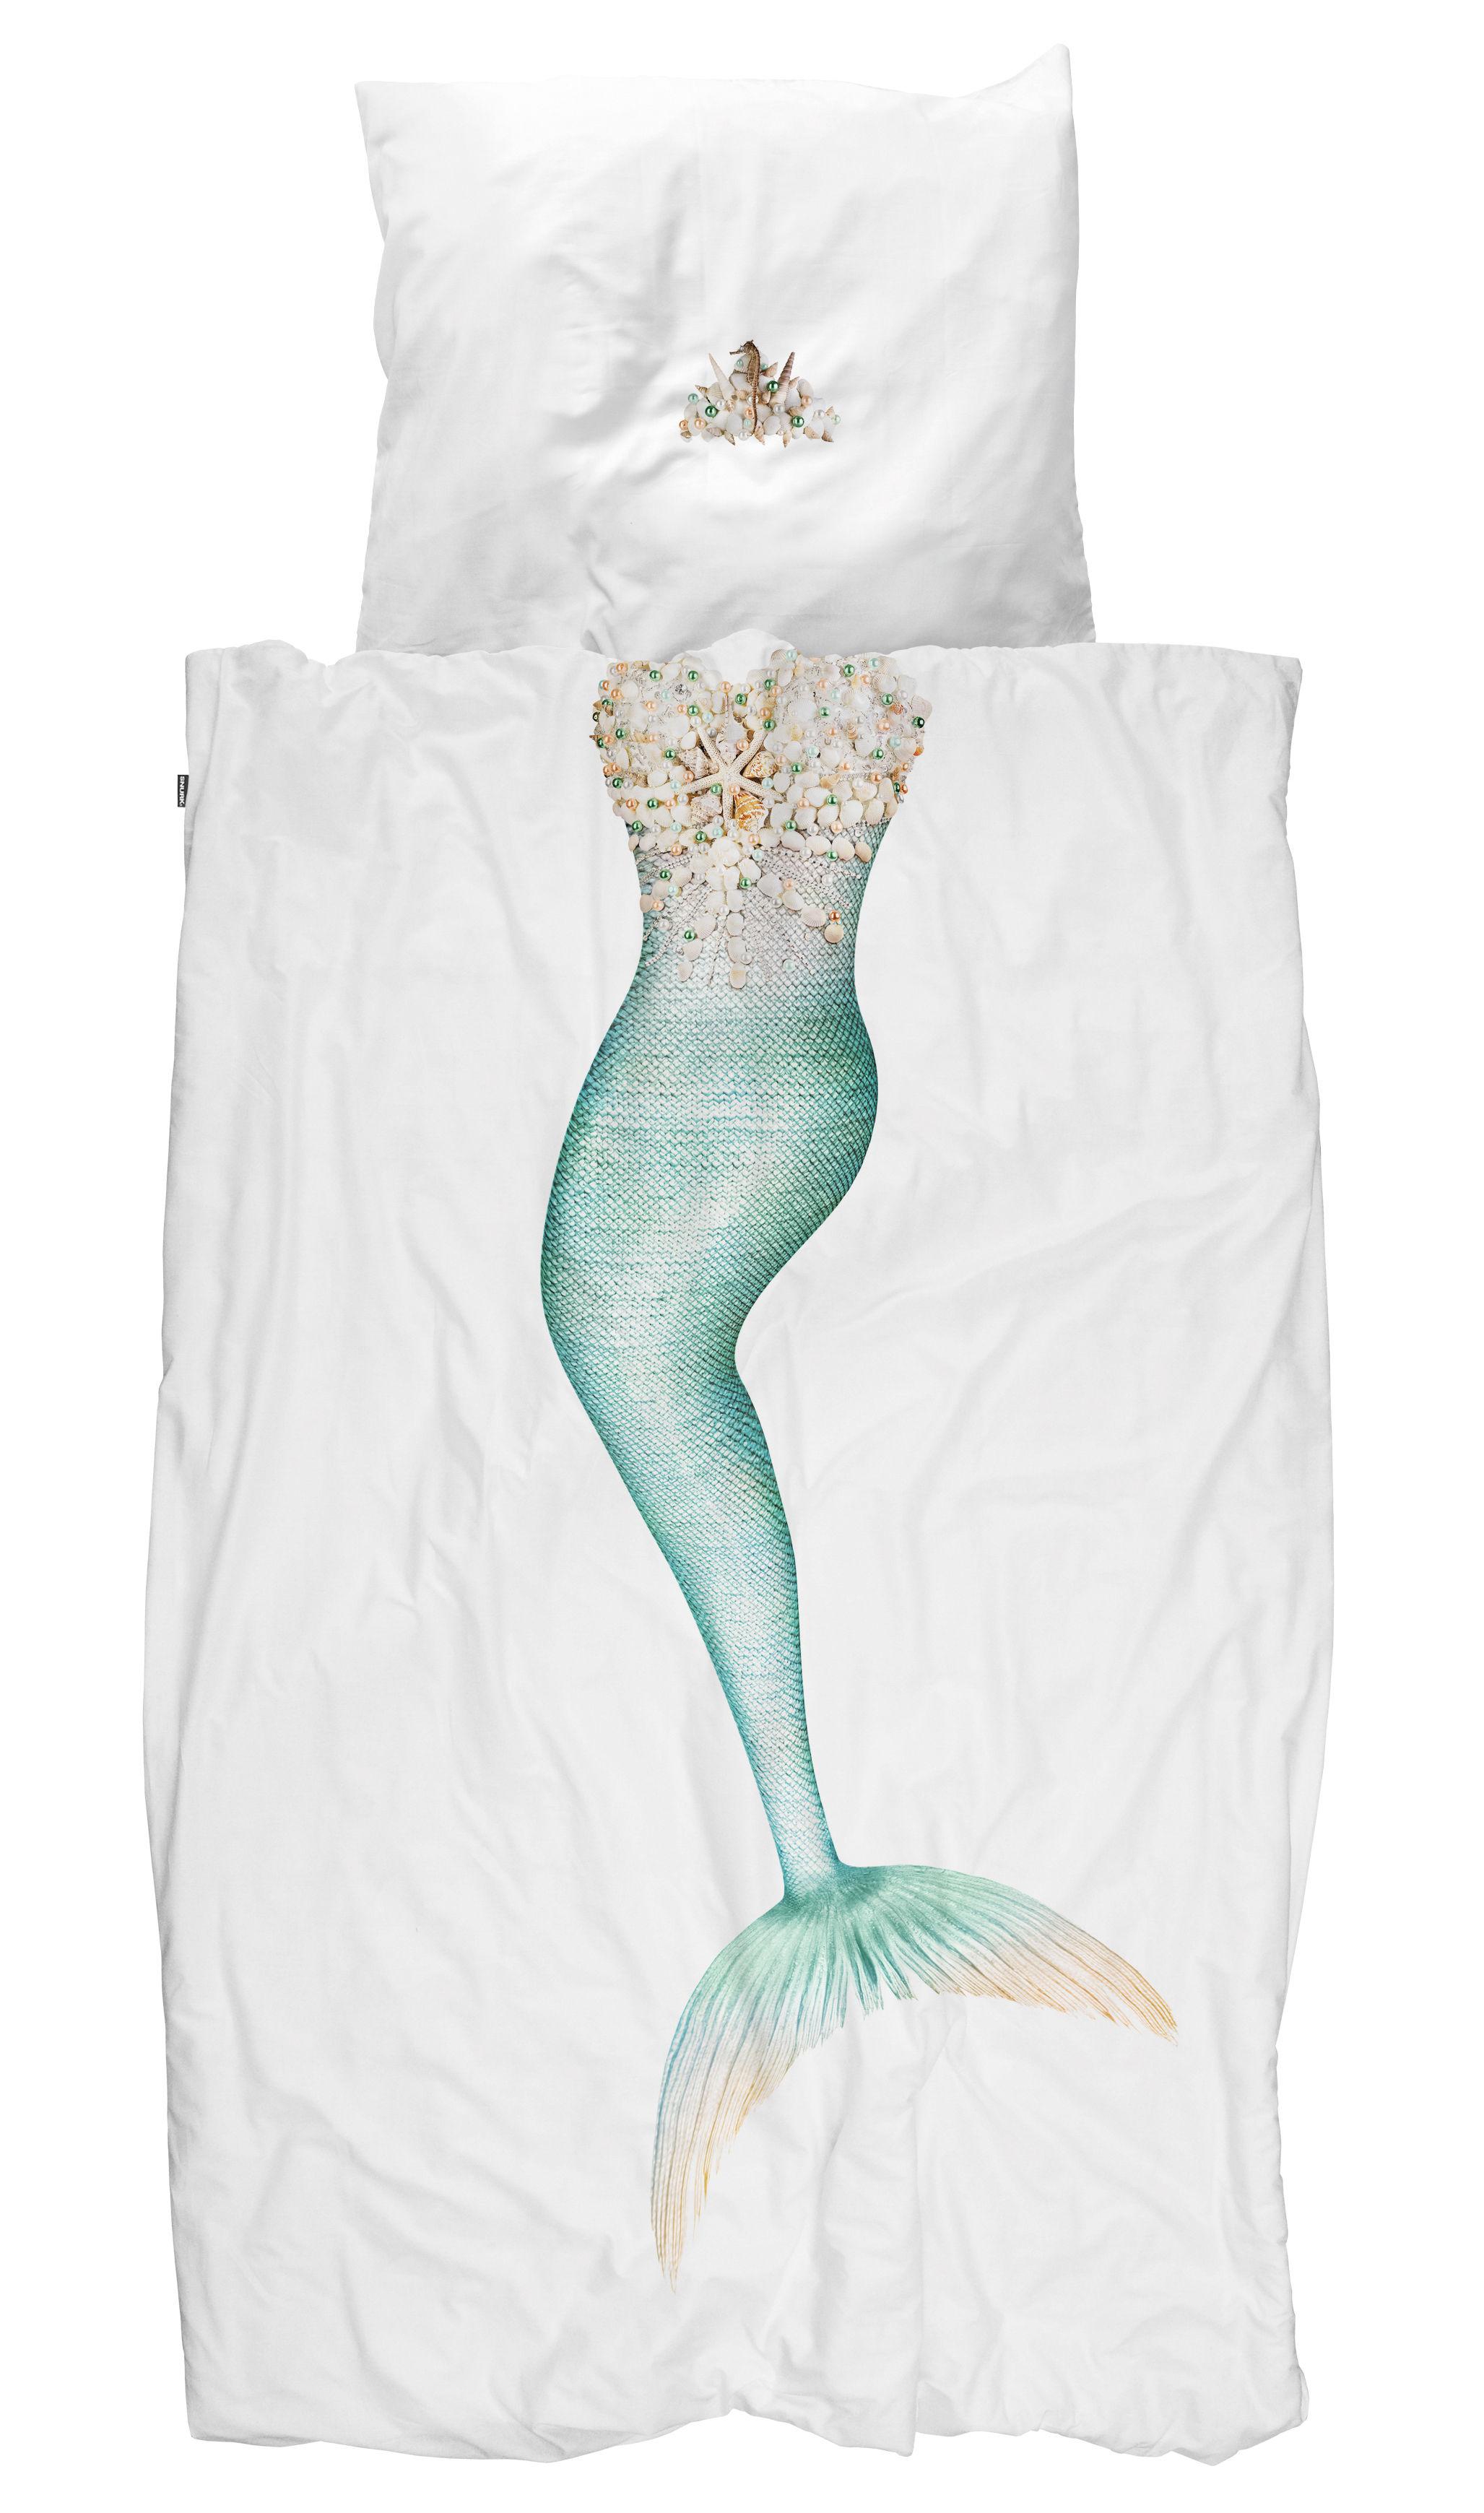 Mermaid Bedlinen Set For 1 Person 135 X 200 Cm Mermaid